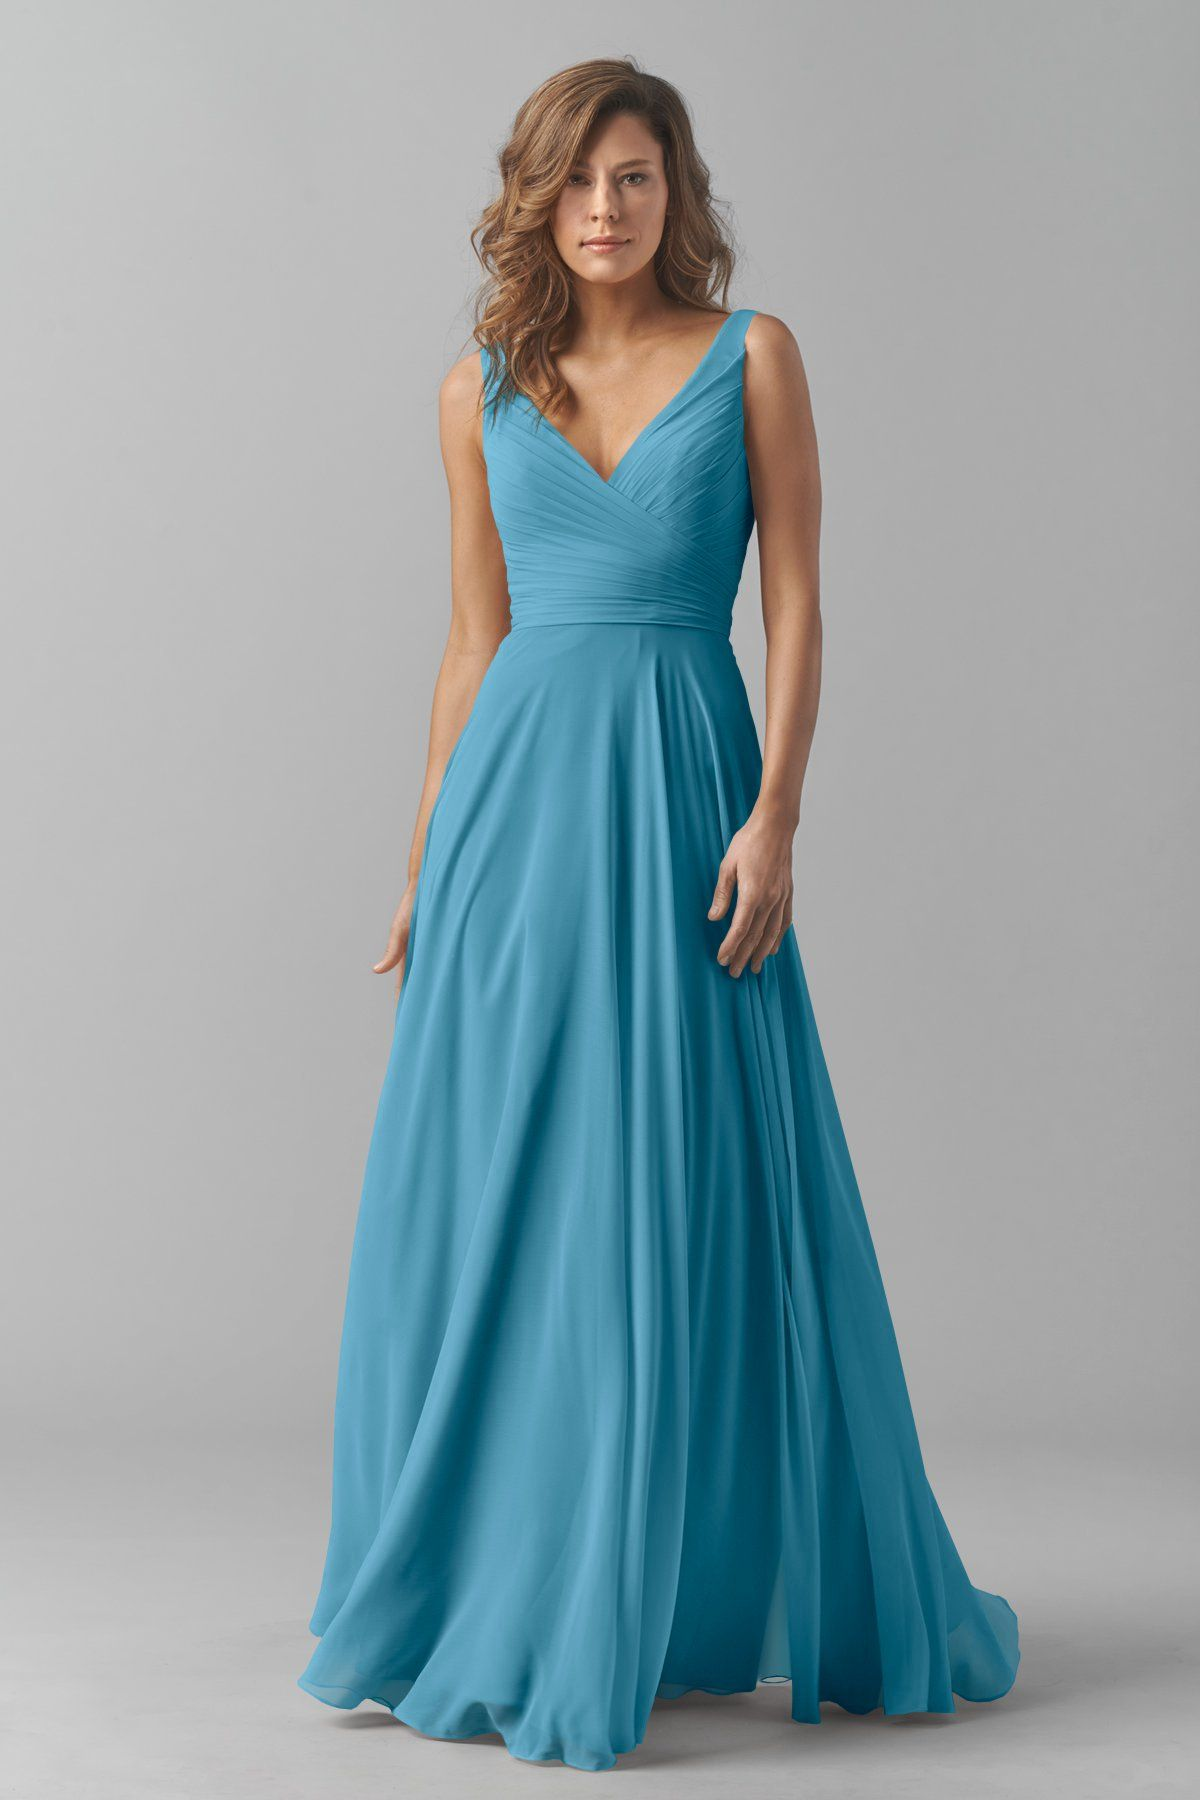 Karen 8542i | Bridesmaids | Watters | bridesmaid dresses | Pinterest ...